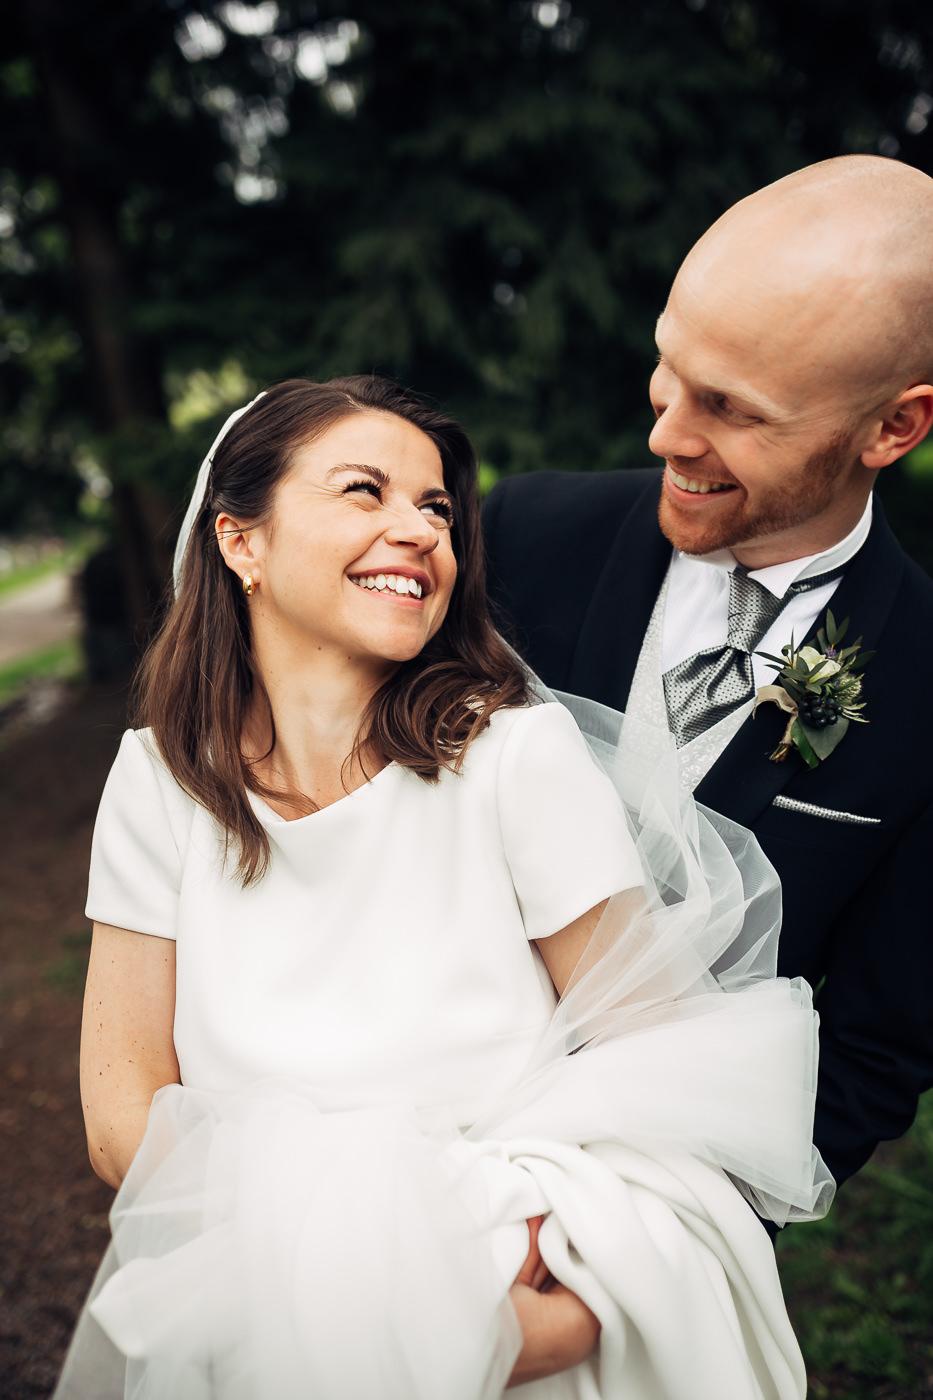 Malene & Ole Martin - elegant dansk- norskt bryllup i Oslo Bryllup Gamle Aker Oslo 40 Akershus